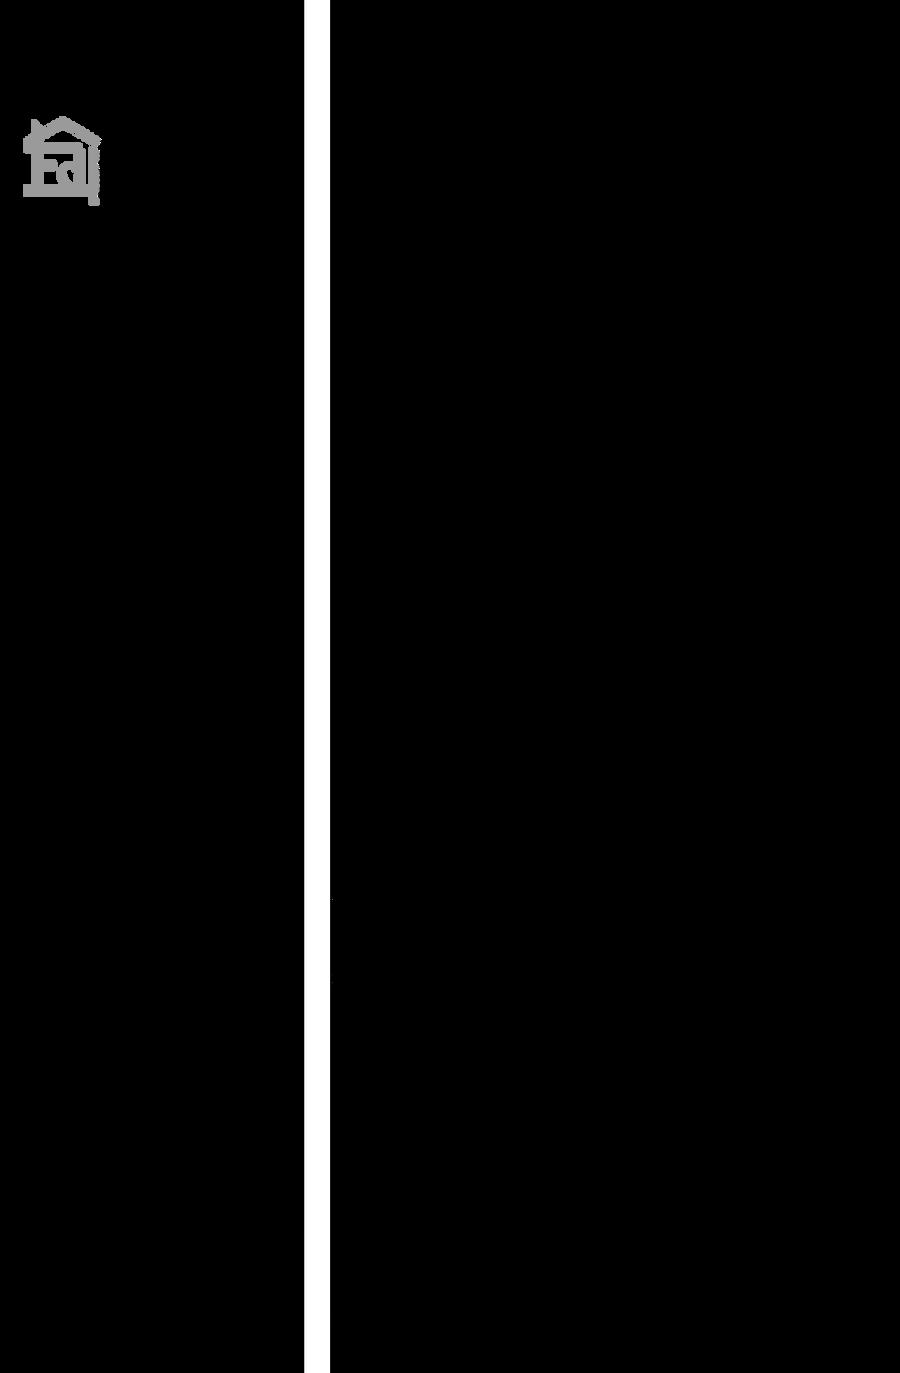 madara lineart by enricoroma87 madara lineart by enricoroma87